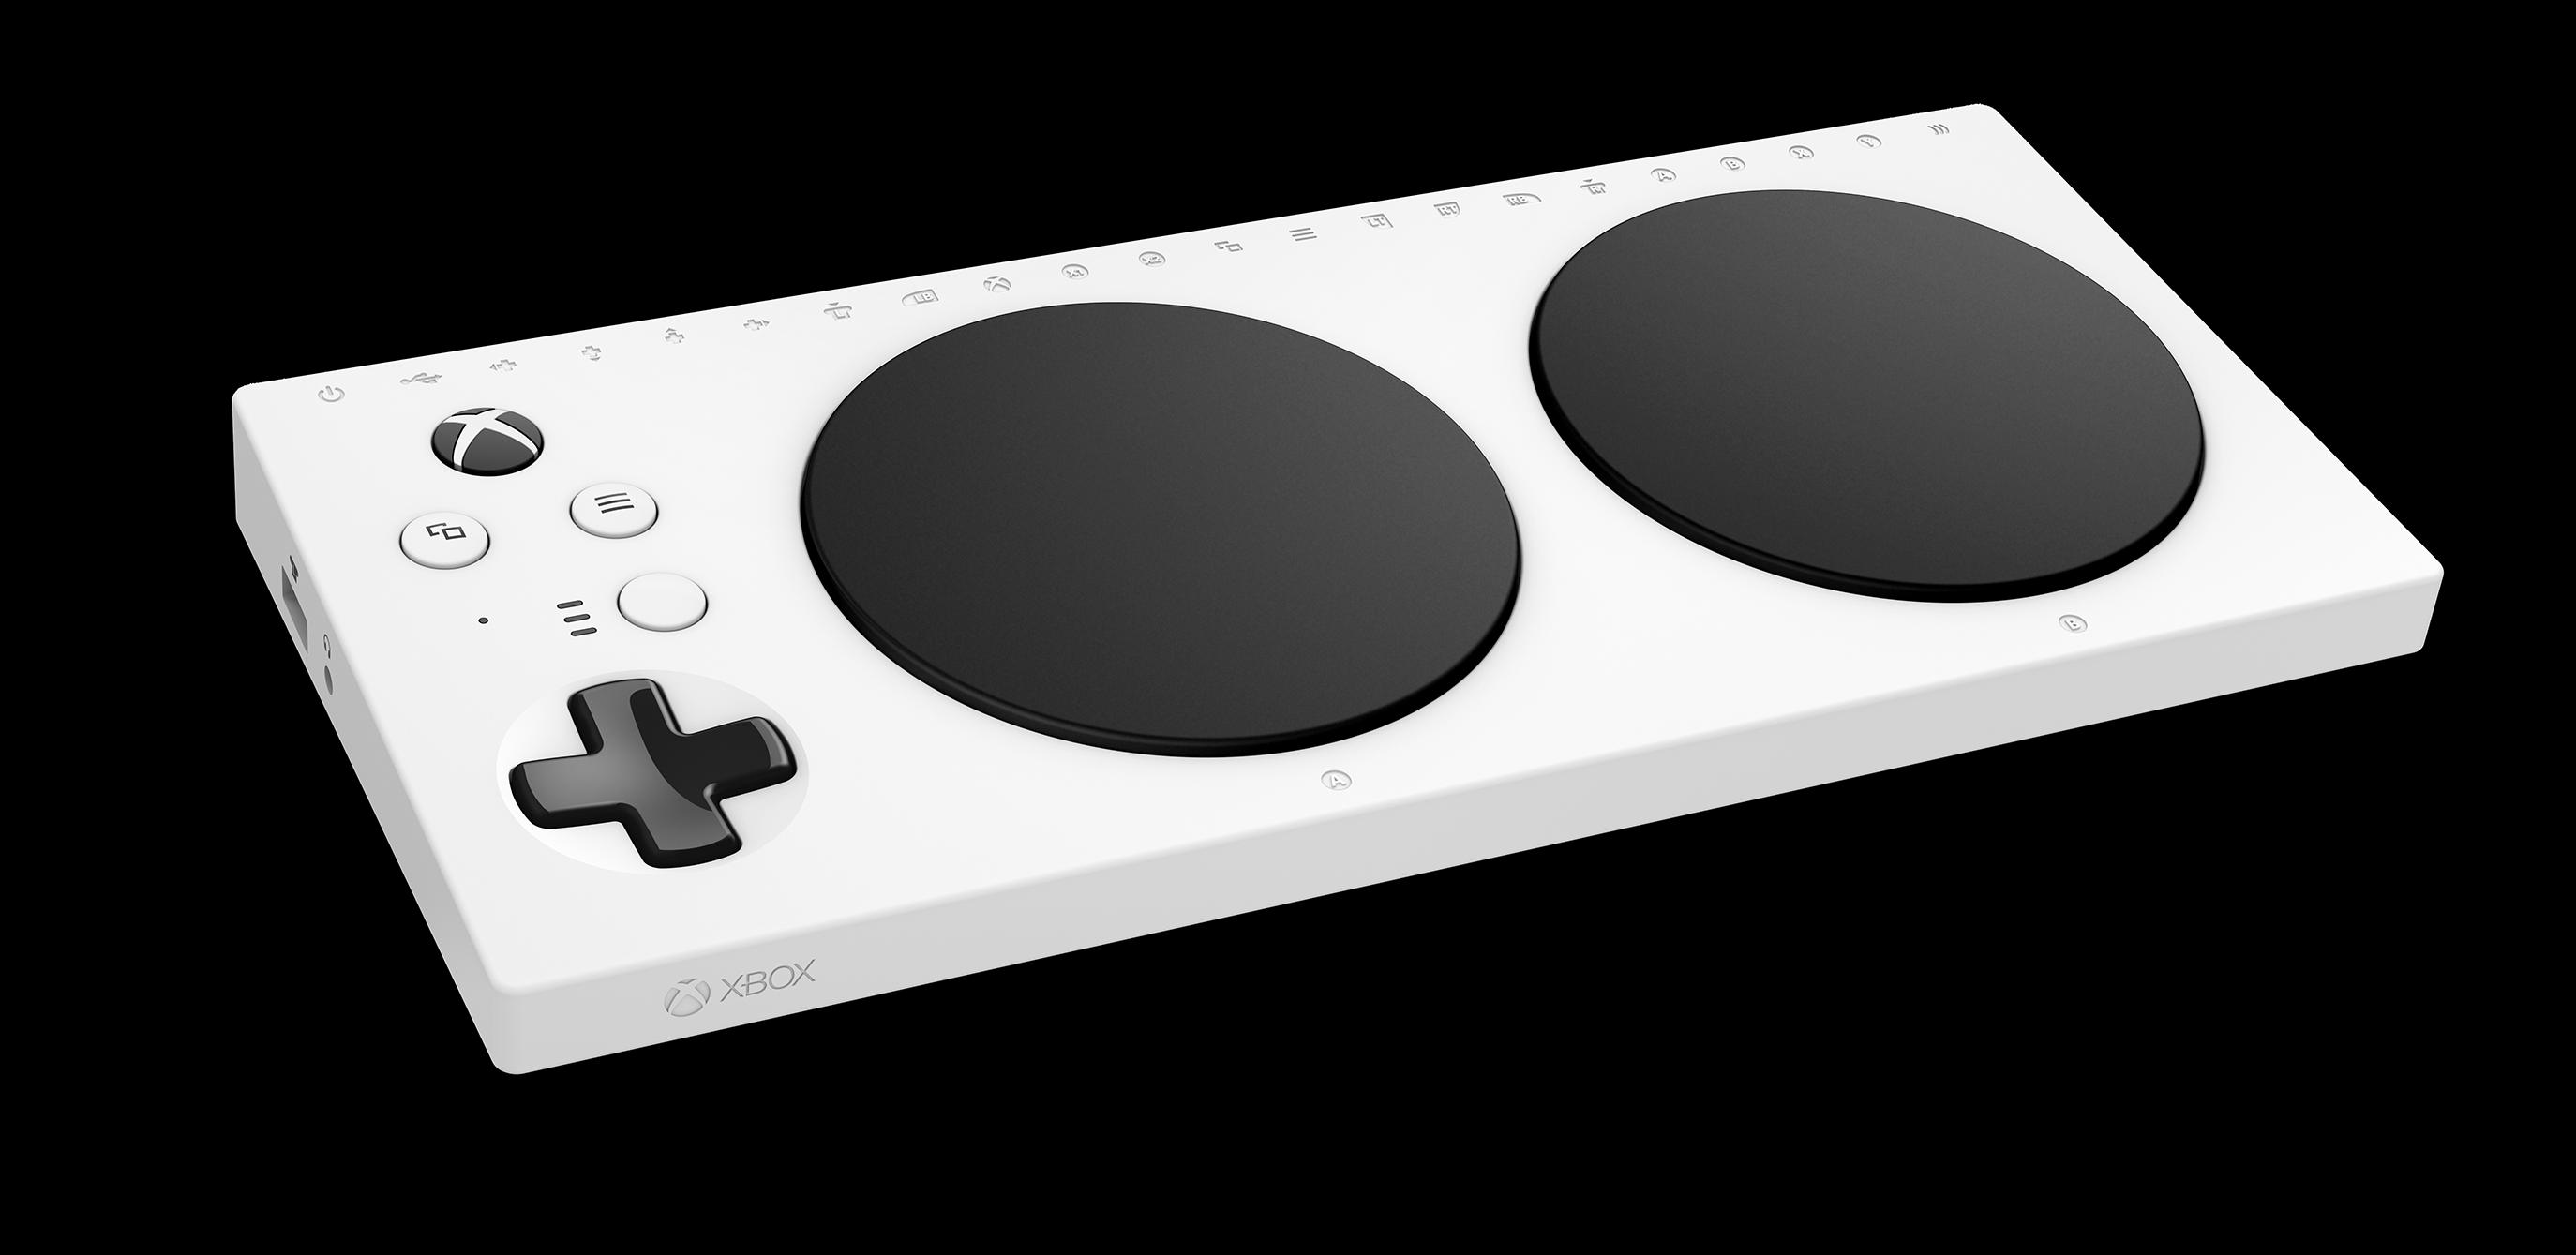 Bureau En Gros Xbox : Xbox accessories microsoft store